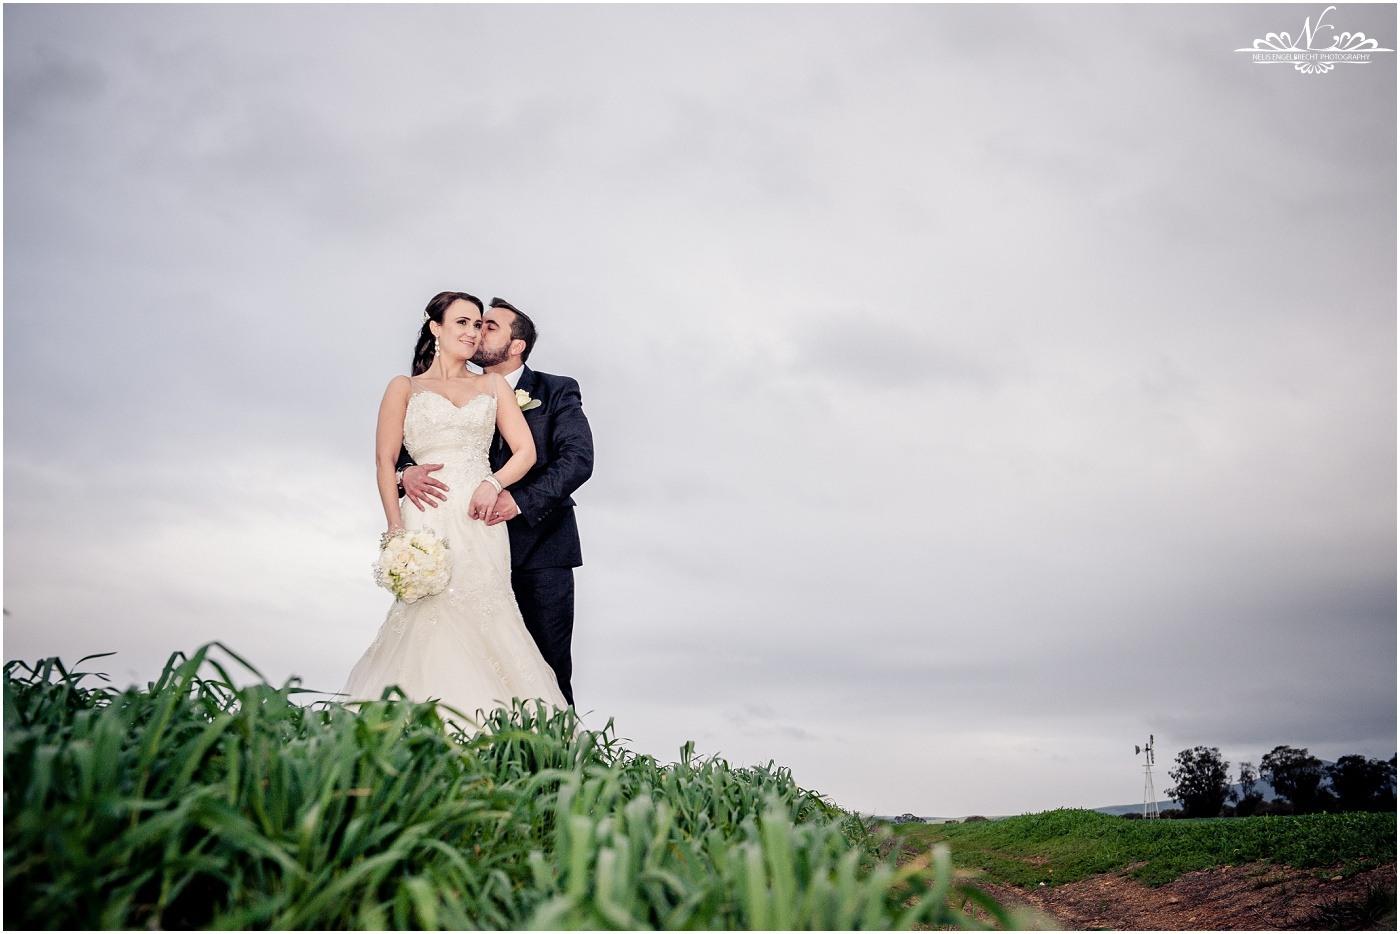 Eensgezind-Wedding-Photos-Nelis-Engelbrecht-Photography-120